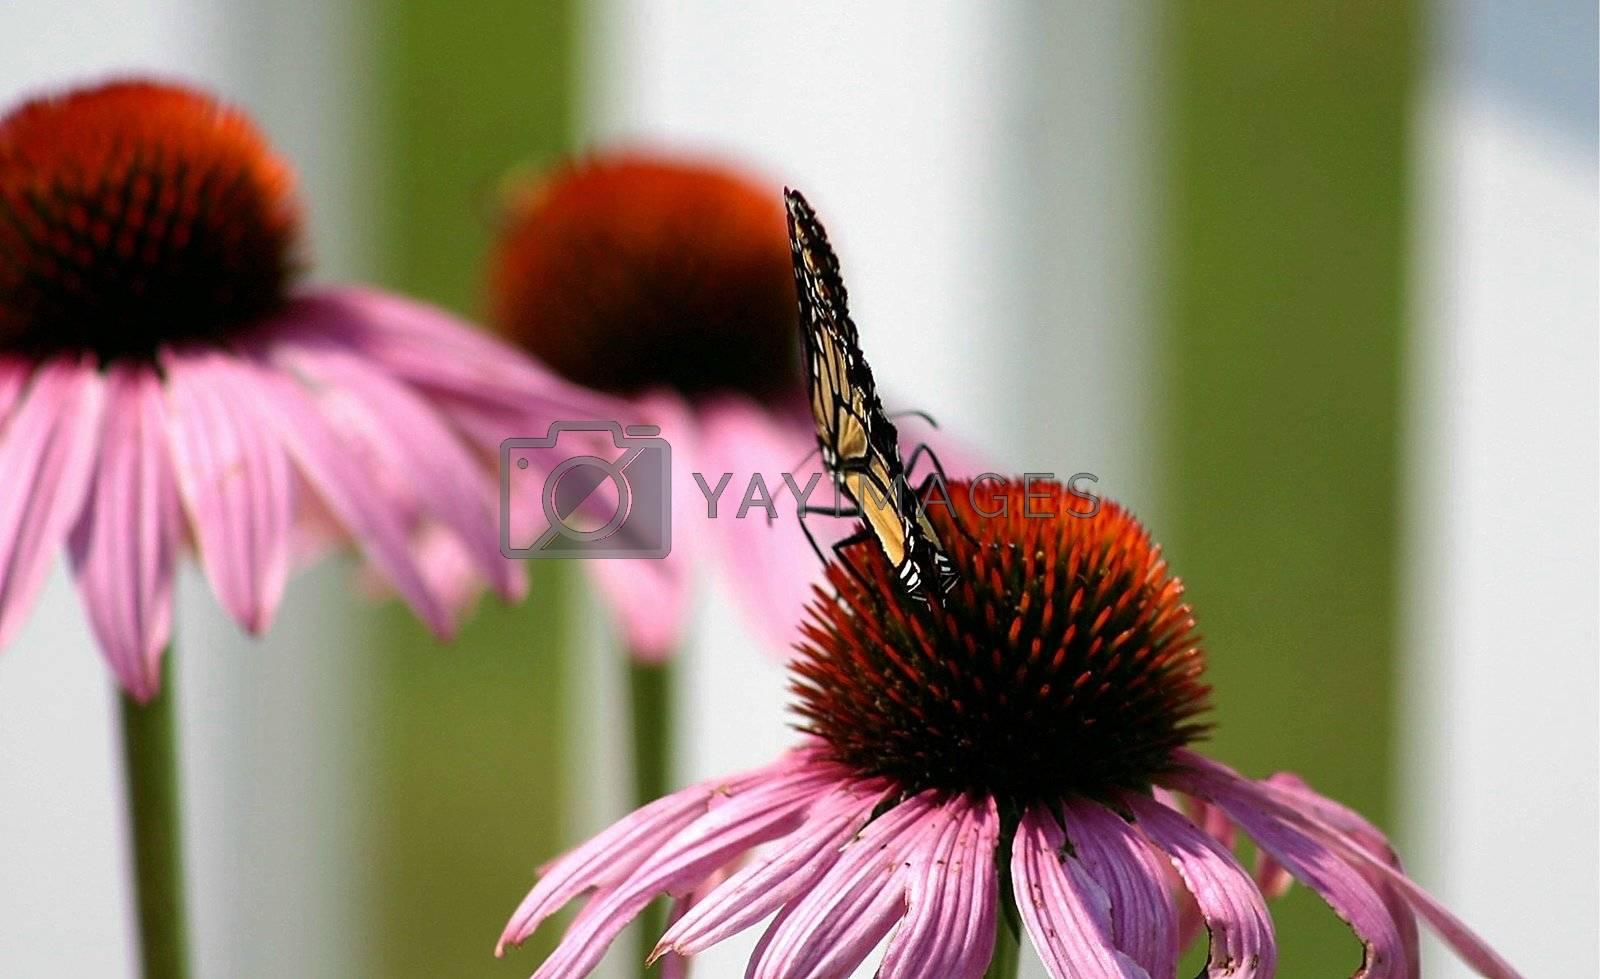 Butterfly resting it's wings on a daffodill